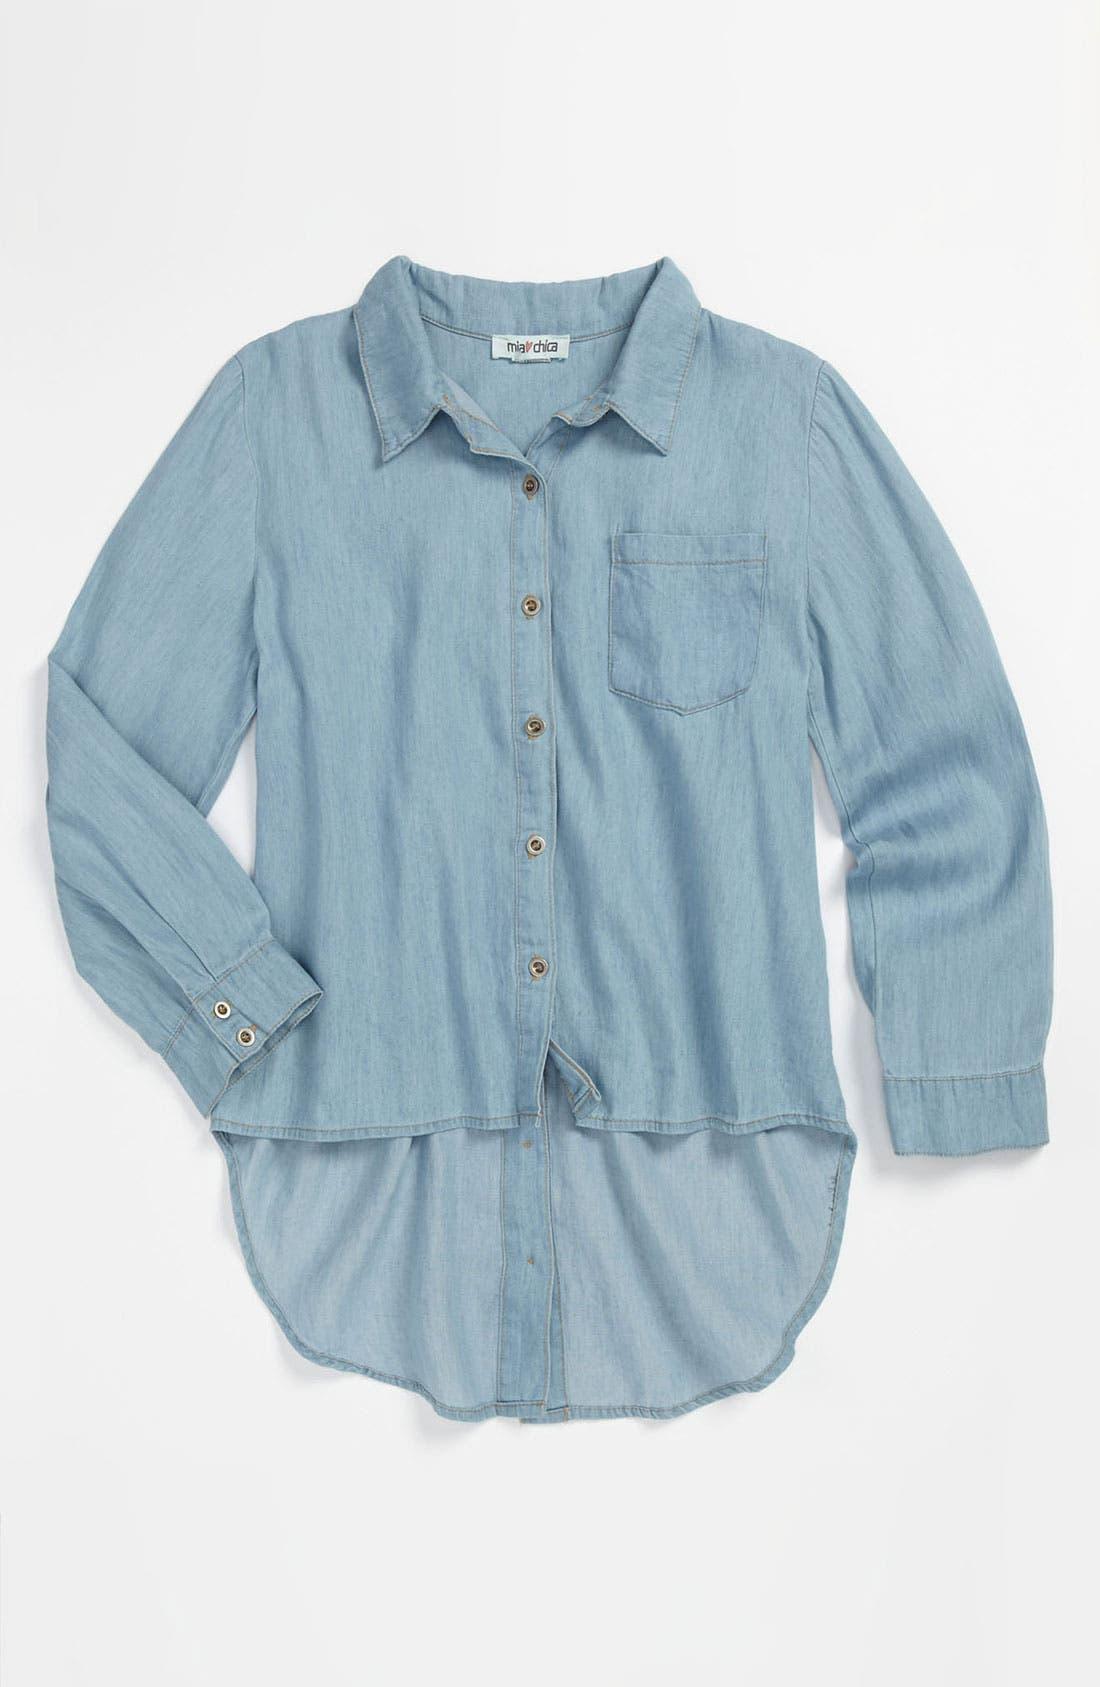 Alternate Image 1 Selected - Mia Chica Chambray Shirt (Big Girls)